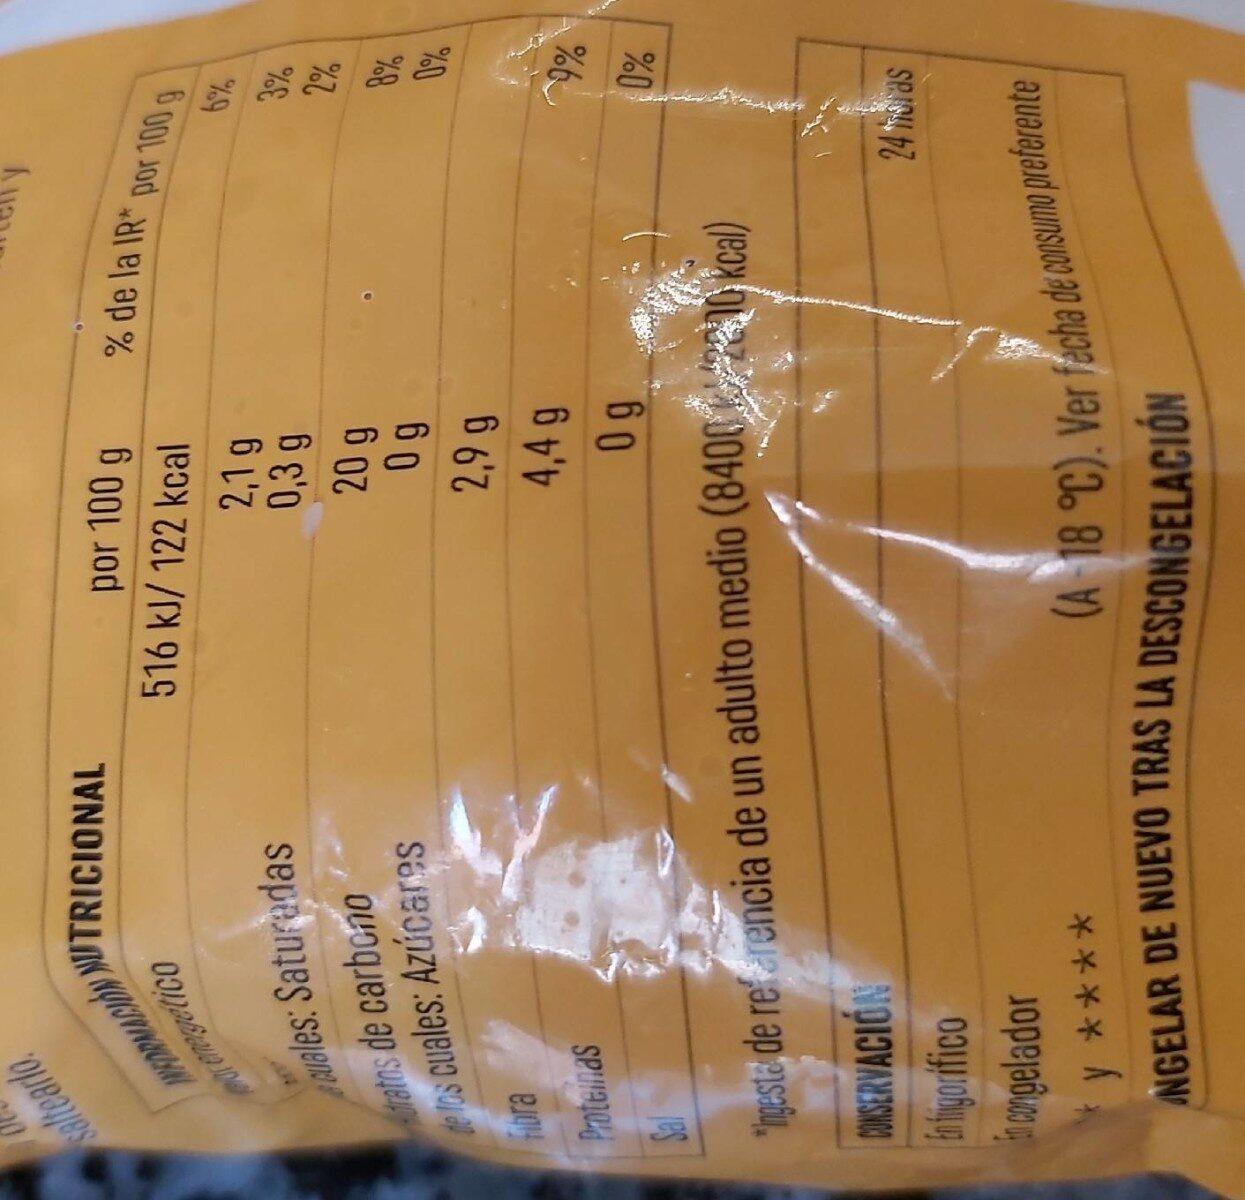 Quinoa precocida - Informations nutritionnelles - es